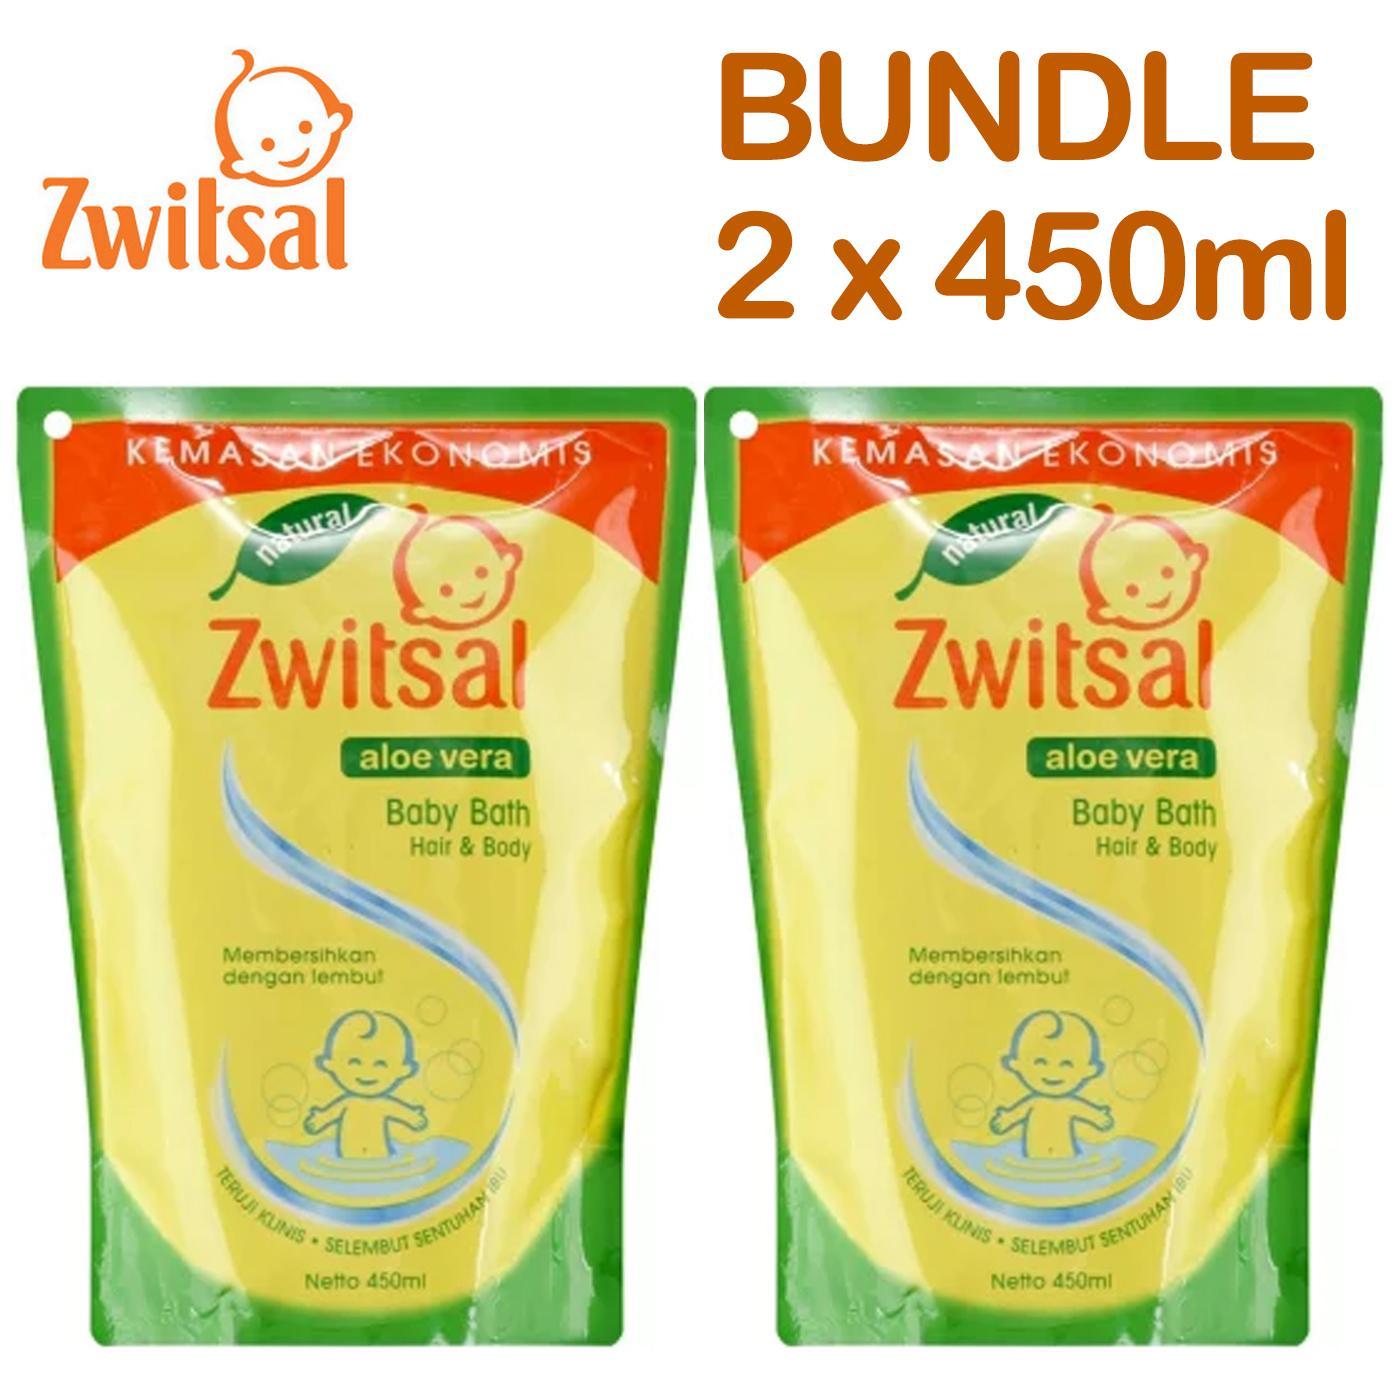 Sabun Cair Bayi Babymax Premium Natural Baby Safe Detergent Refill 600ml Zwitsal Bath 2in1 Hair Body 450ml Pouch 2 Pcs